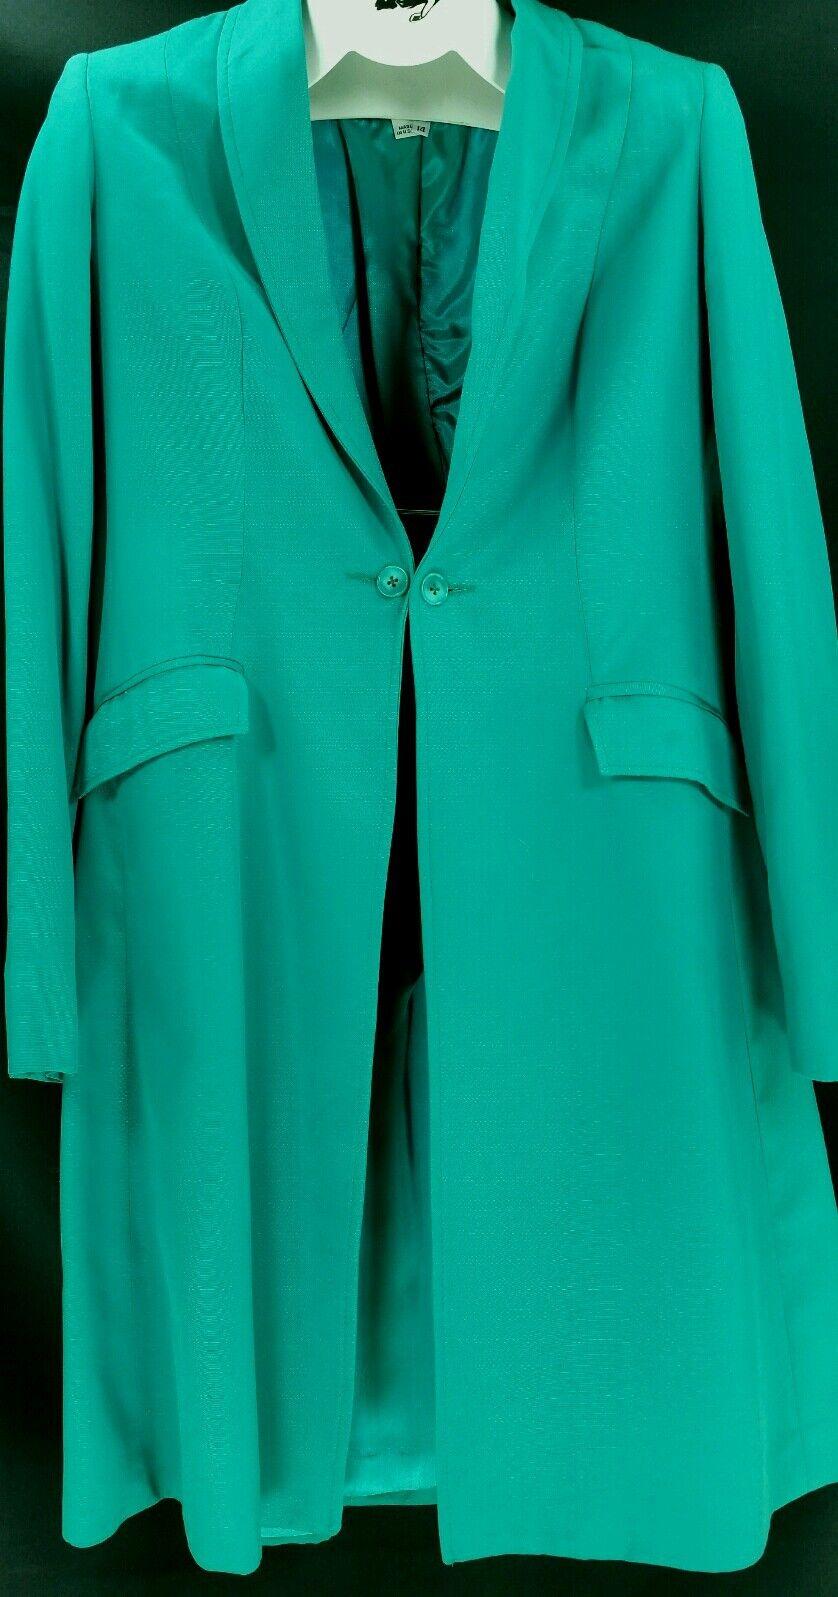 Reed Hill Ladies Saddleseat Day Coat Emerald Green   Polyester size 14 - USA  zero profit